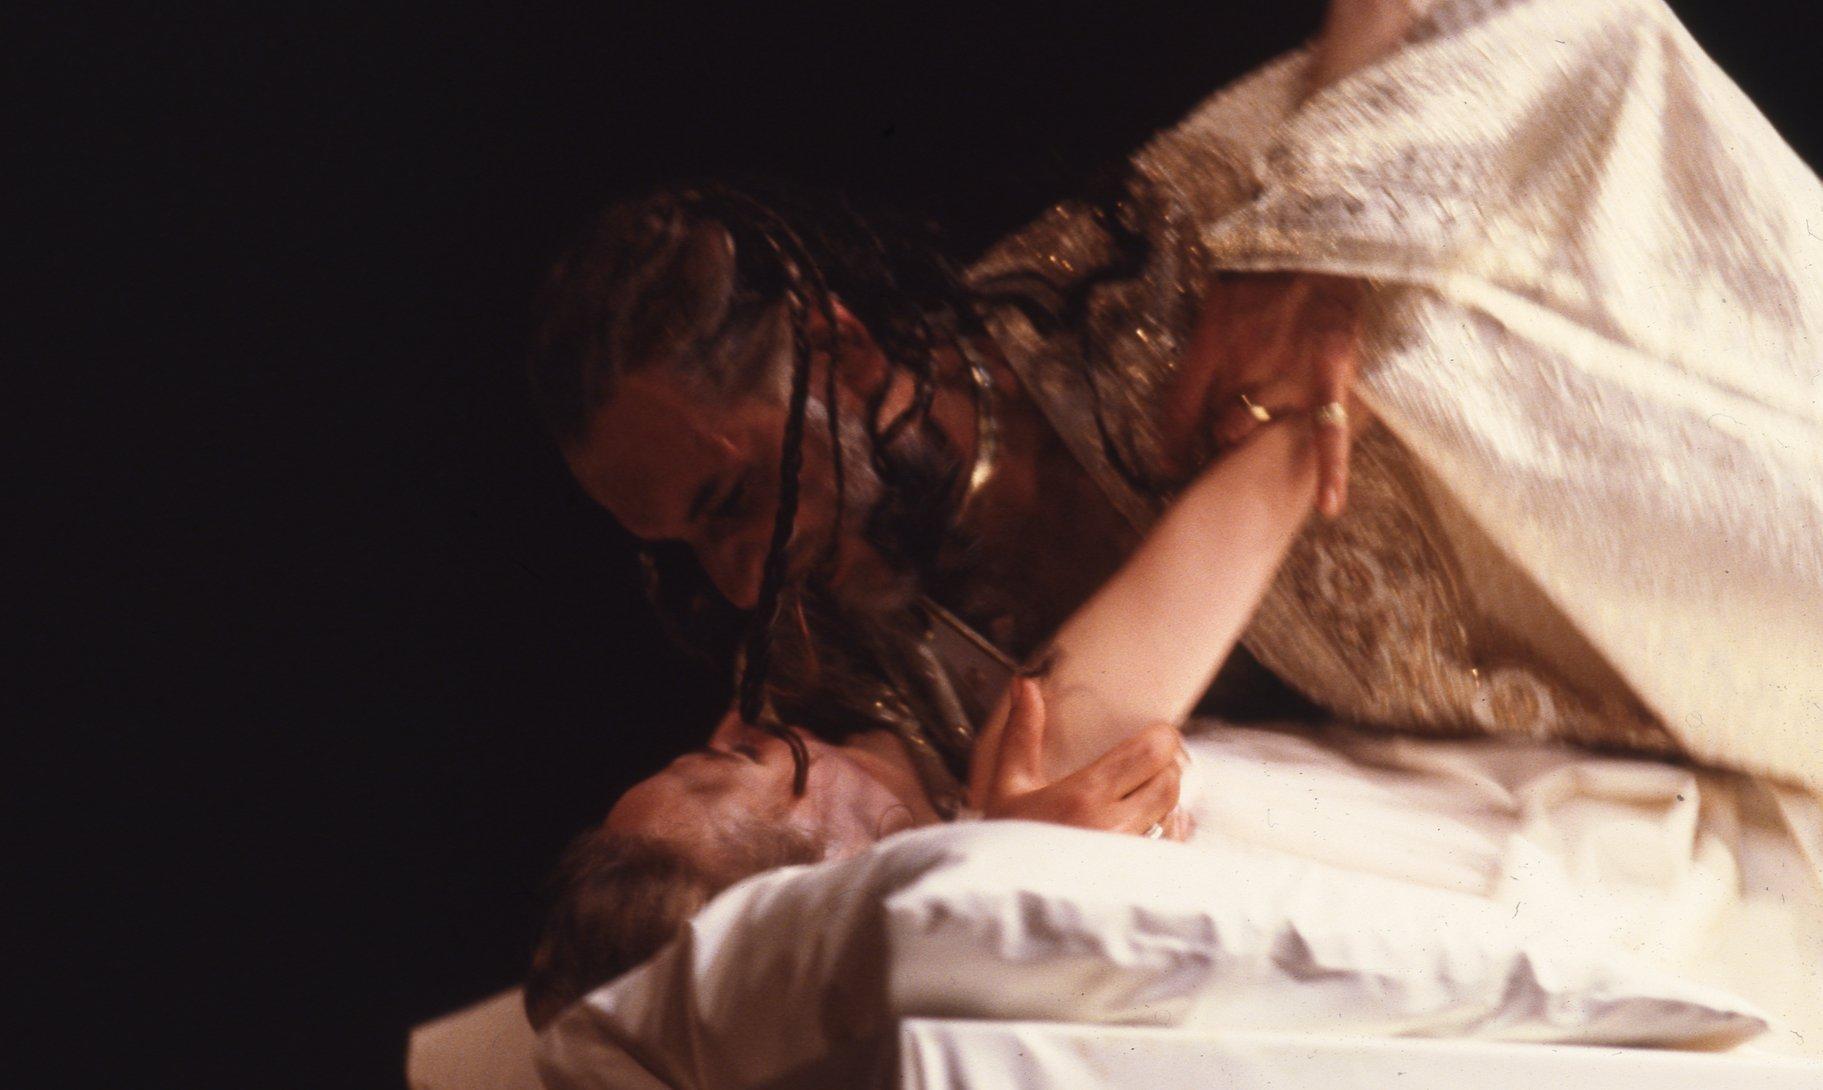 Othello is about to strangle Desdemona.